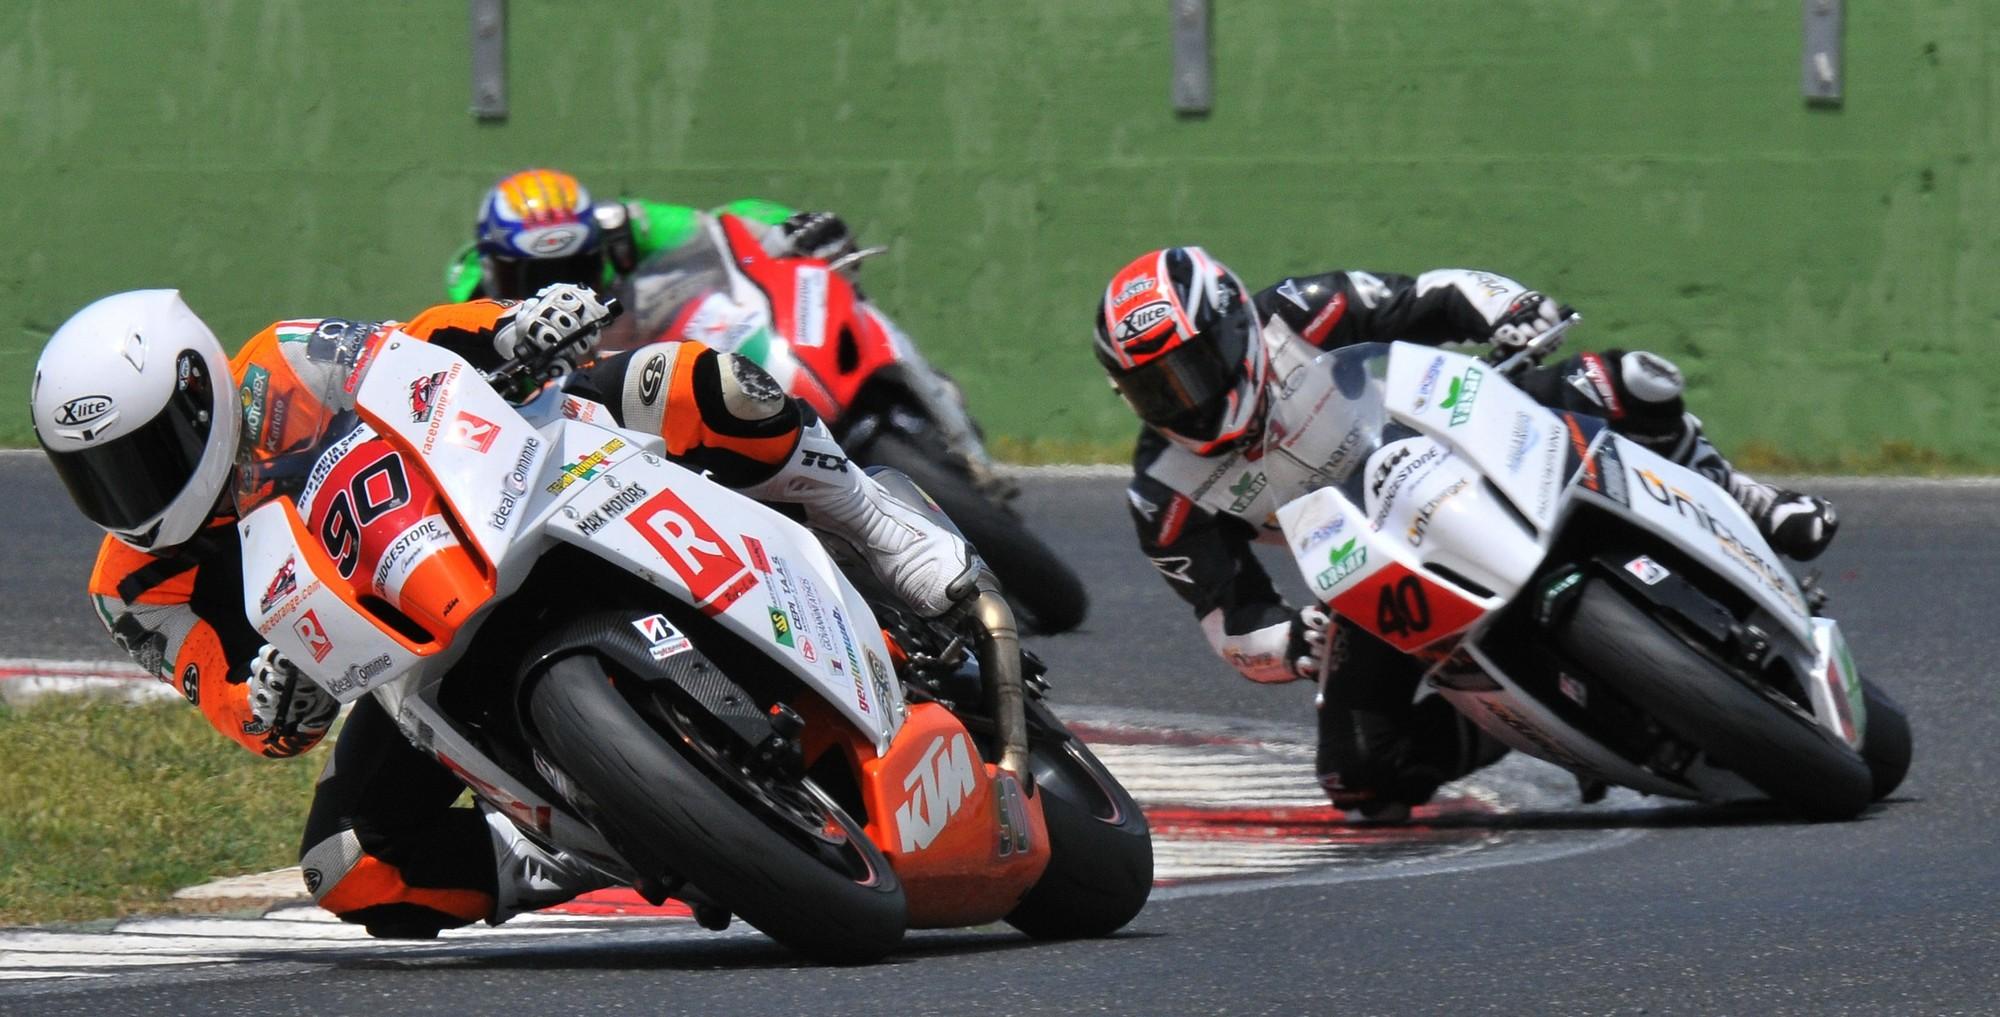 Circuito Vallelunga : Mini challenge il punto su gara a vallelunga motorinolimits